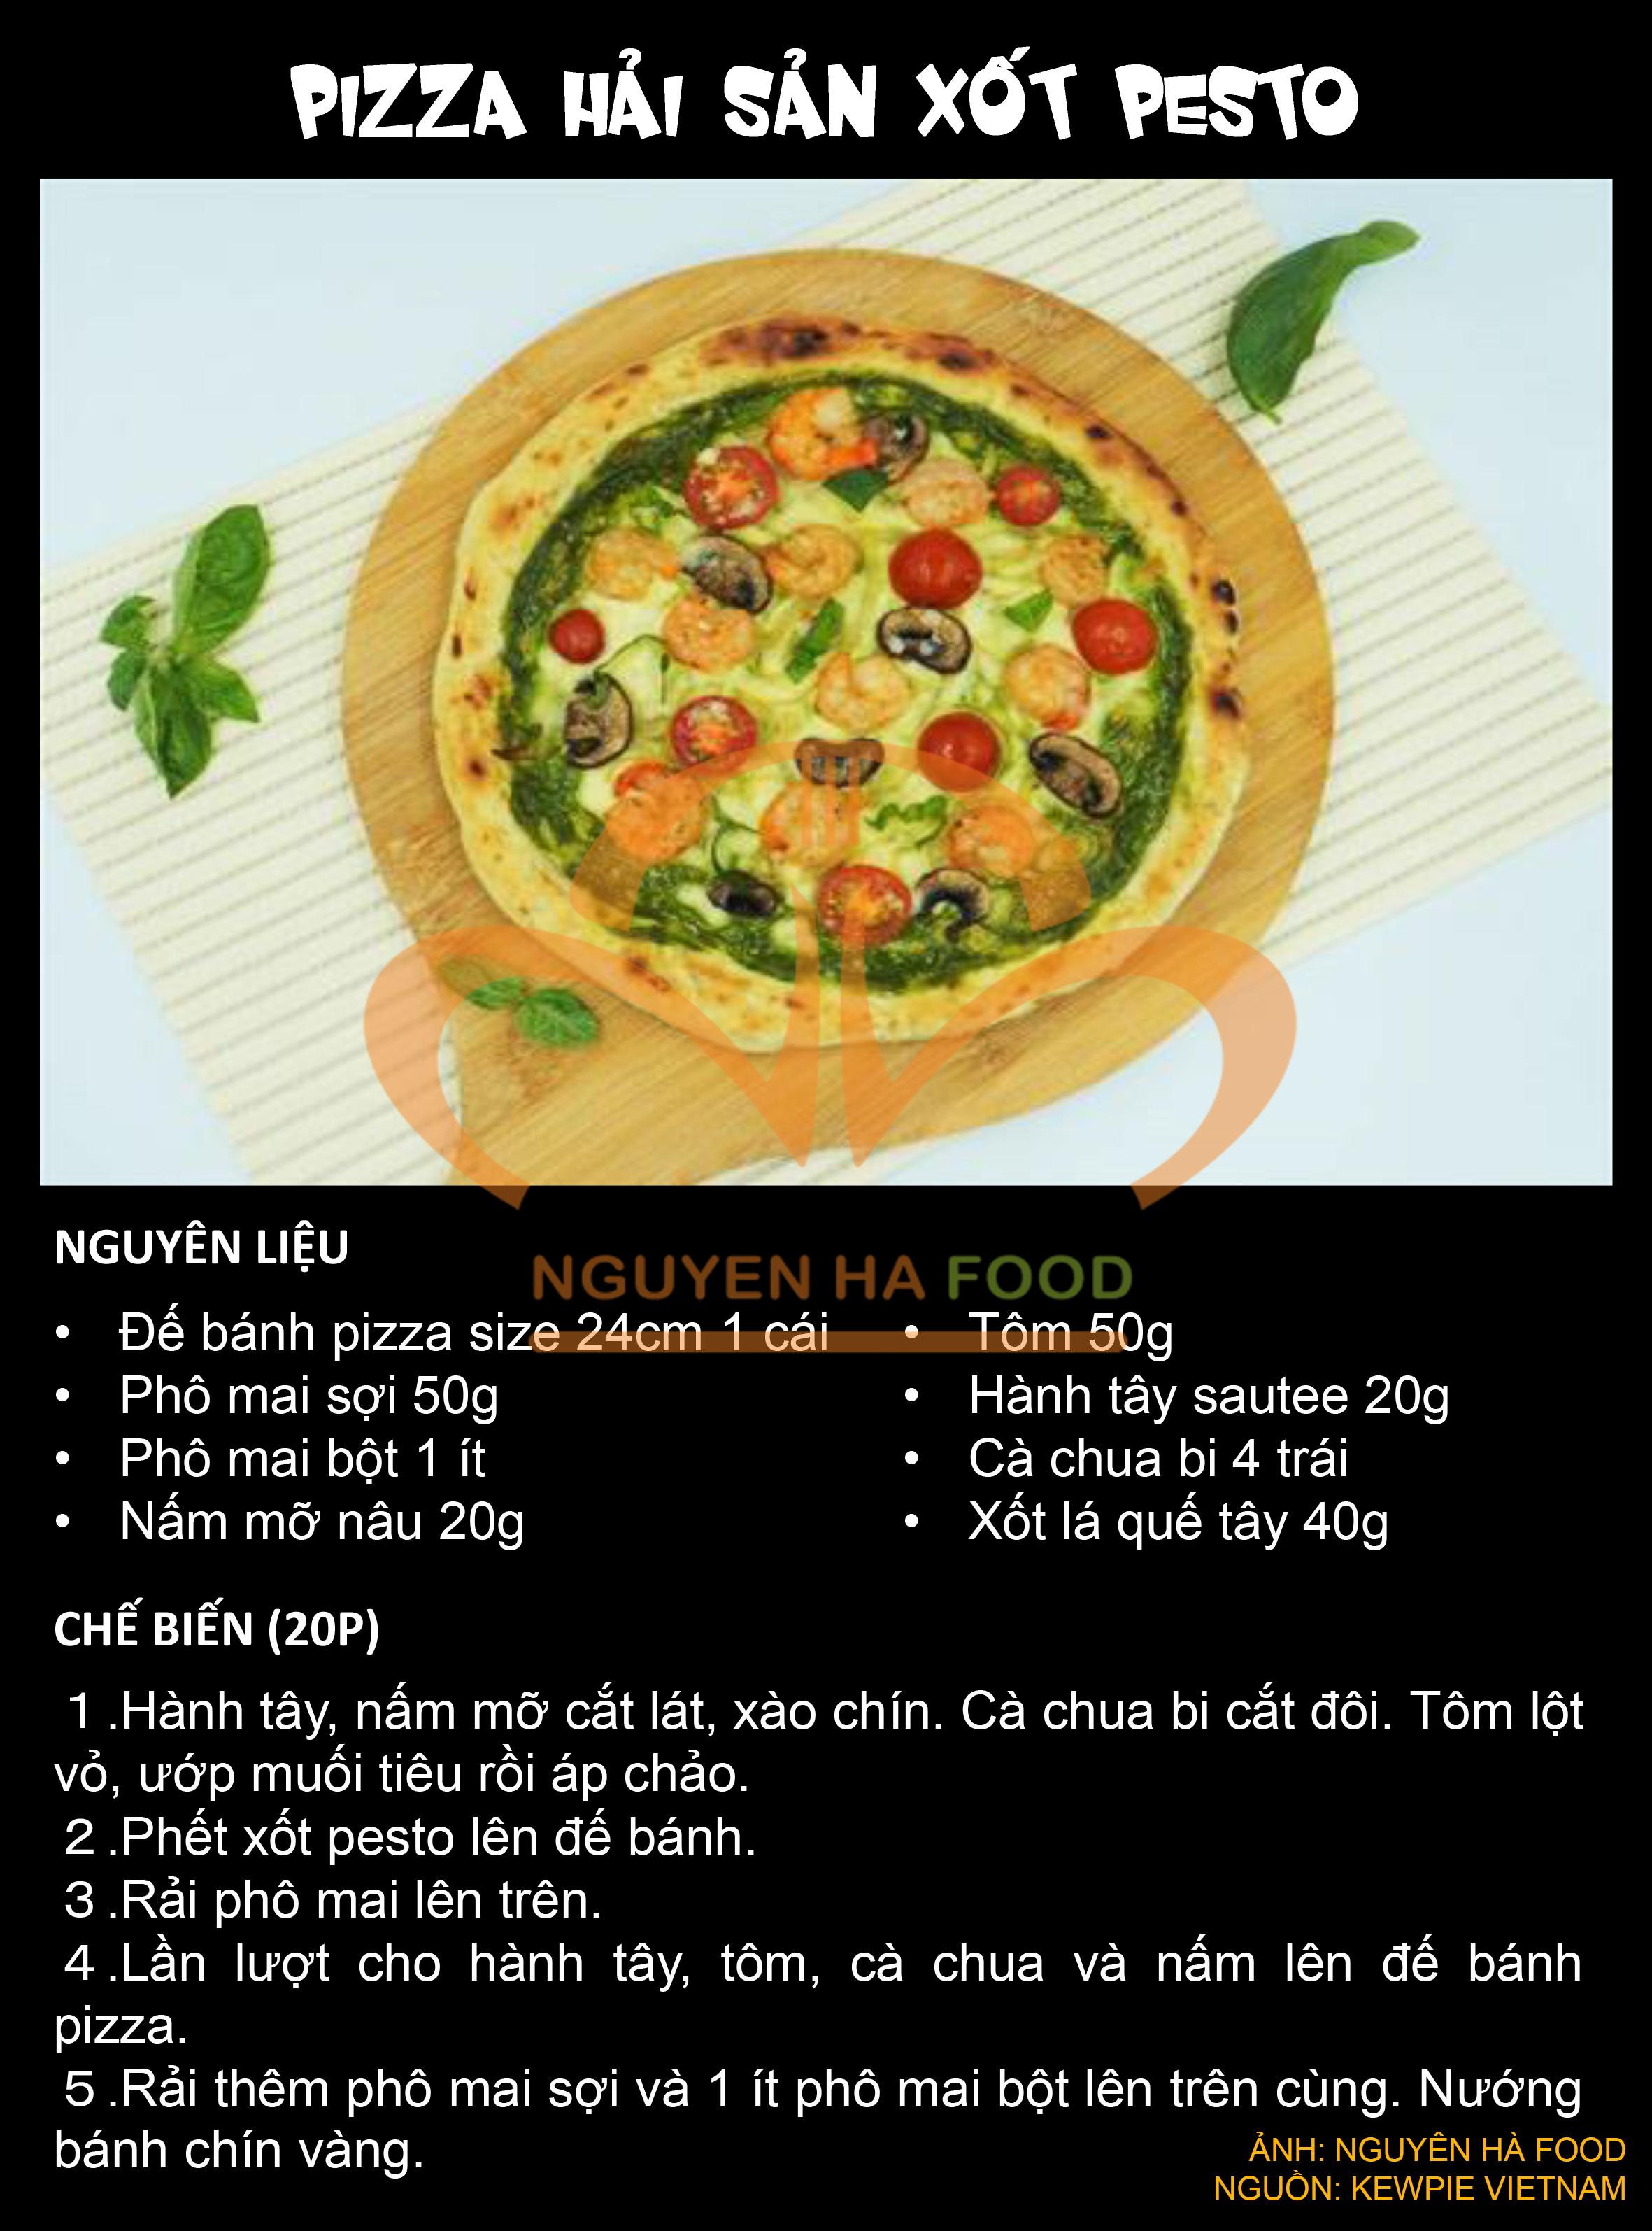 4 PIZZA HAI SAN XOT PESTO KEWPIE - NGUYEN HA FOOD